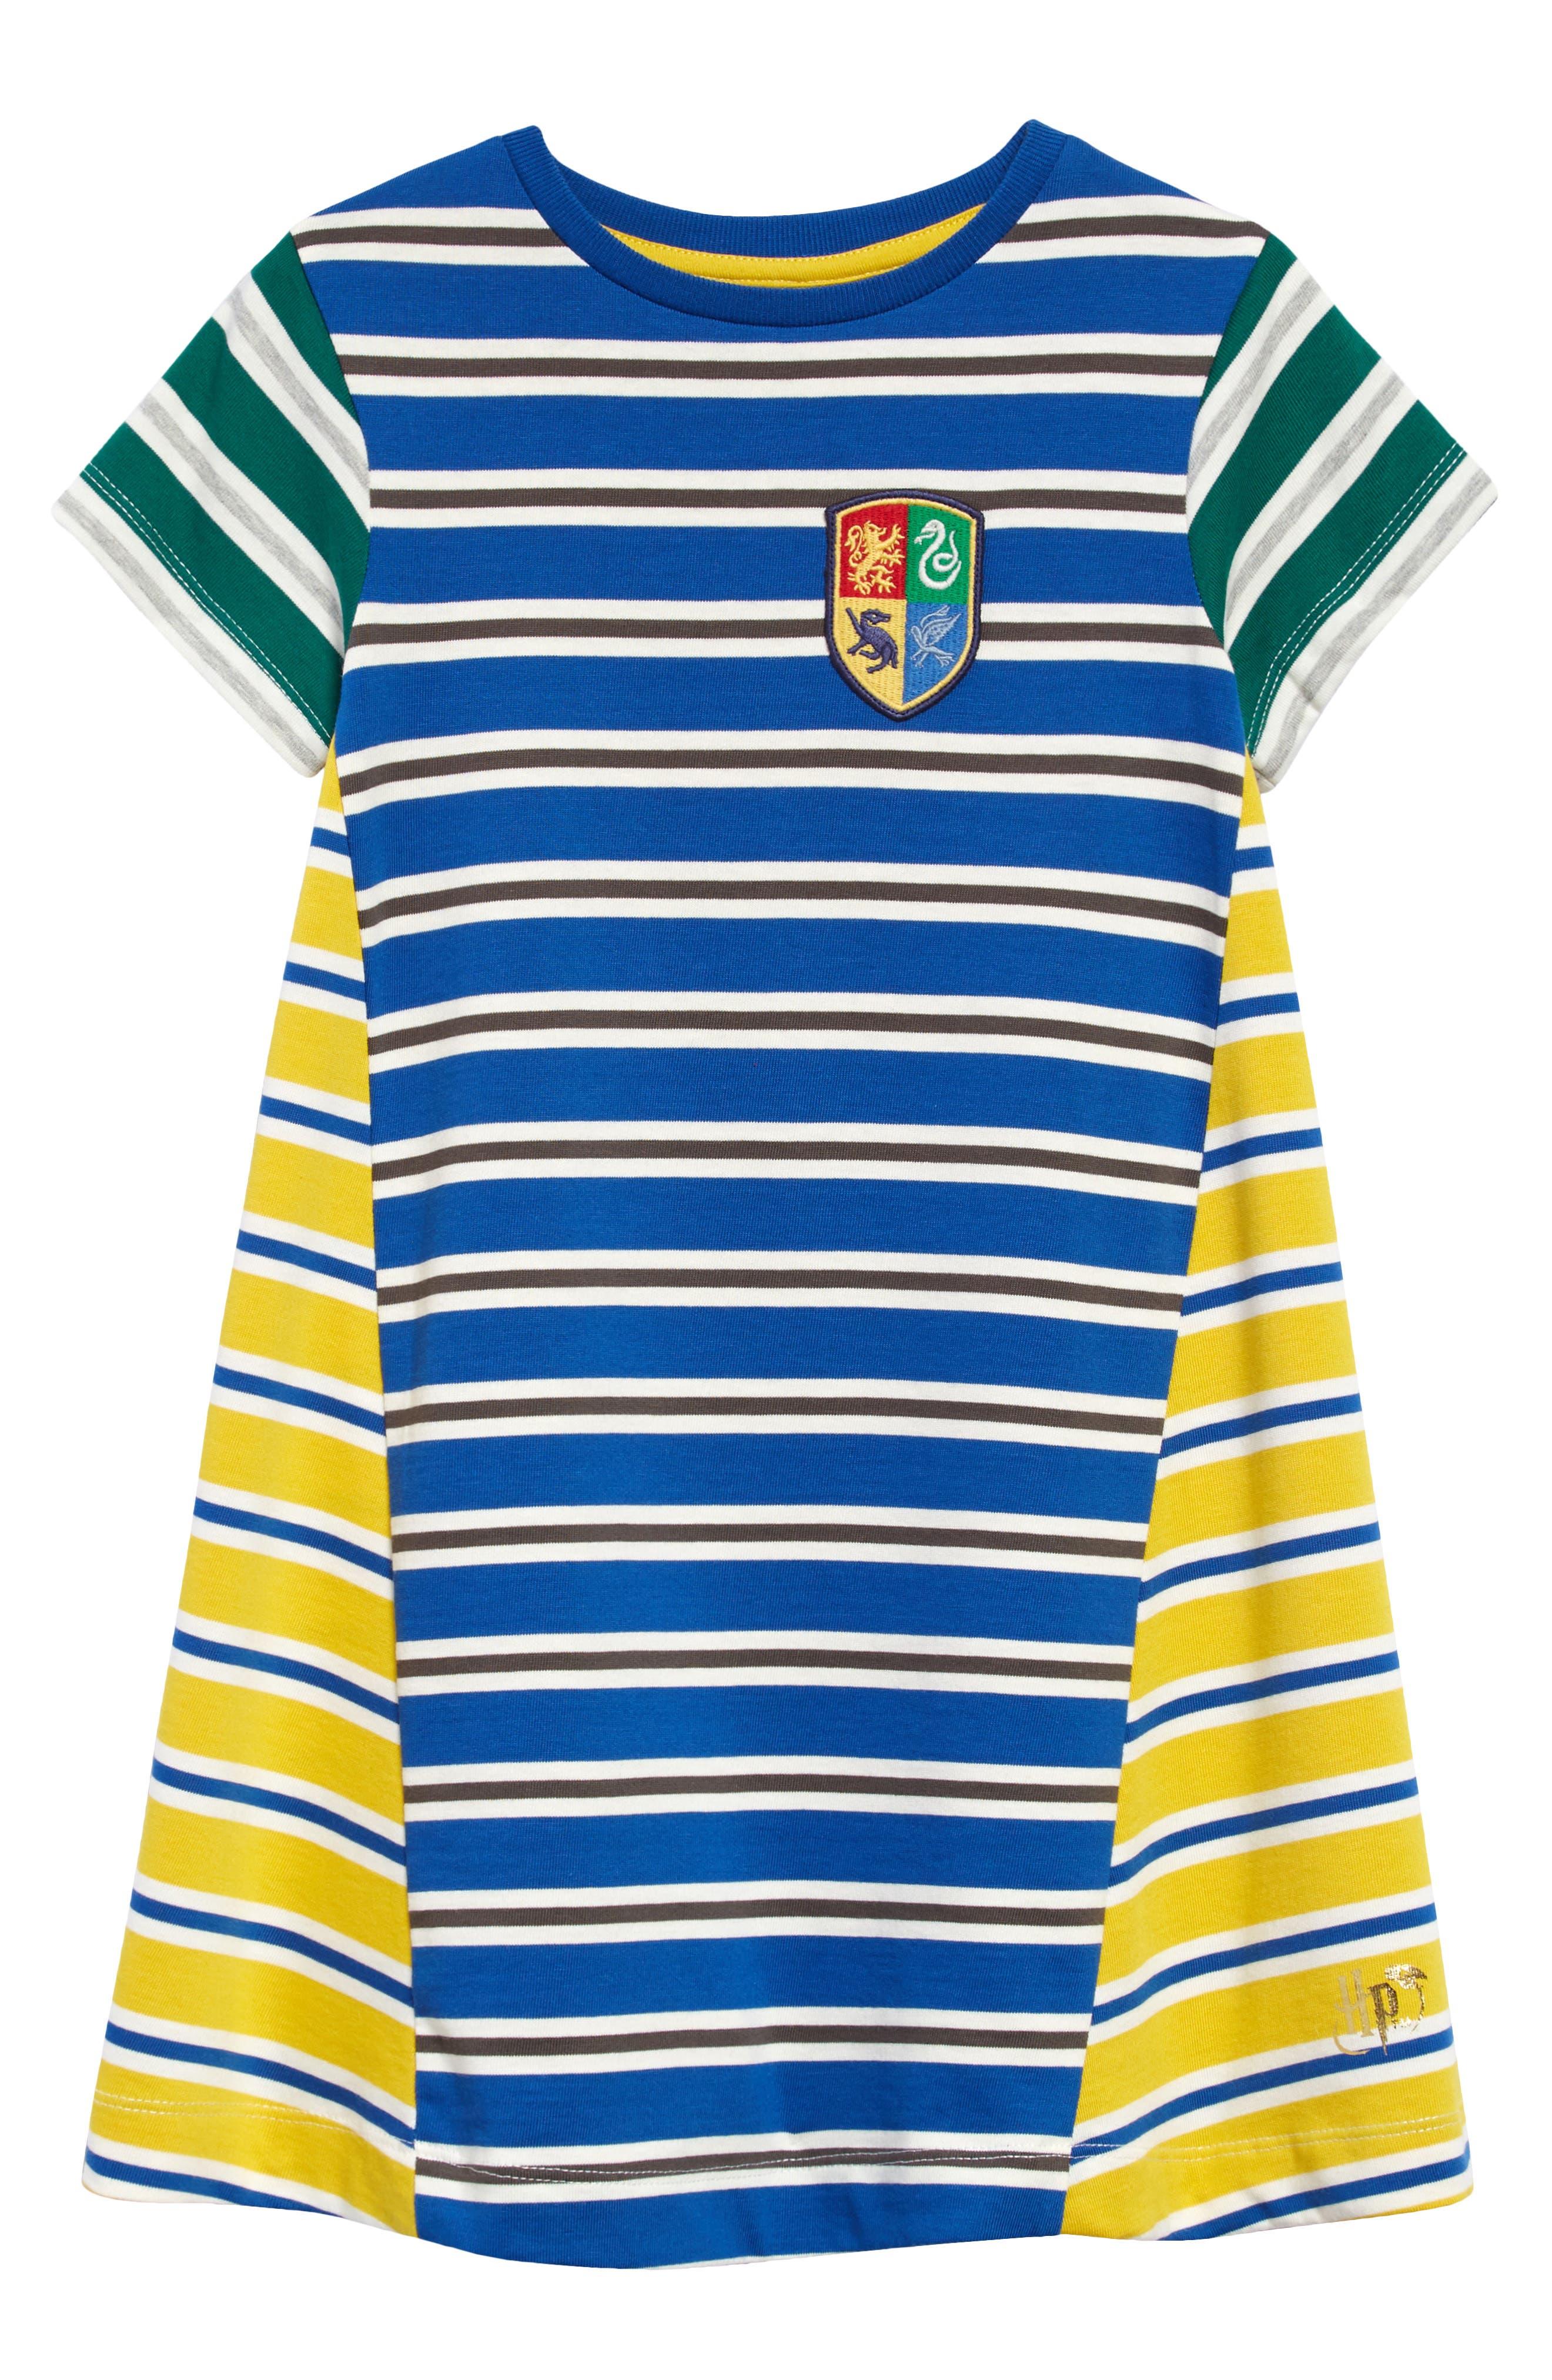 Baby Bottle B Blue Cotton Girl Toddler Long Sleeve Ruffle Shirt Top